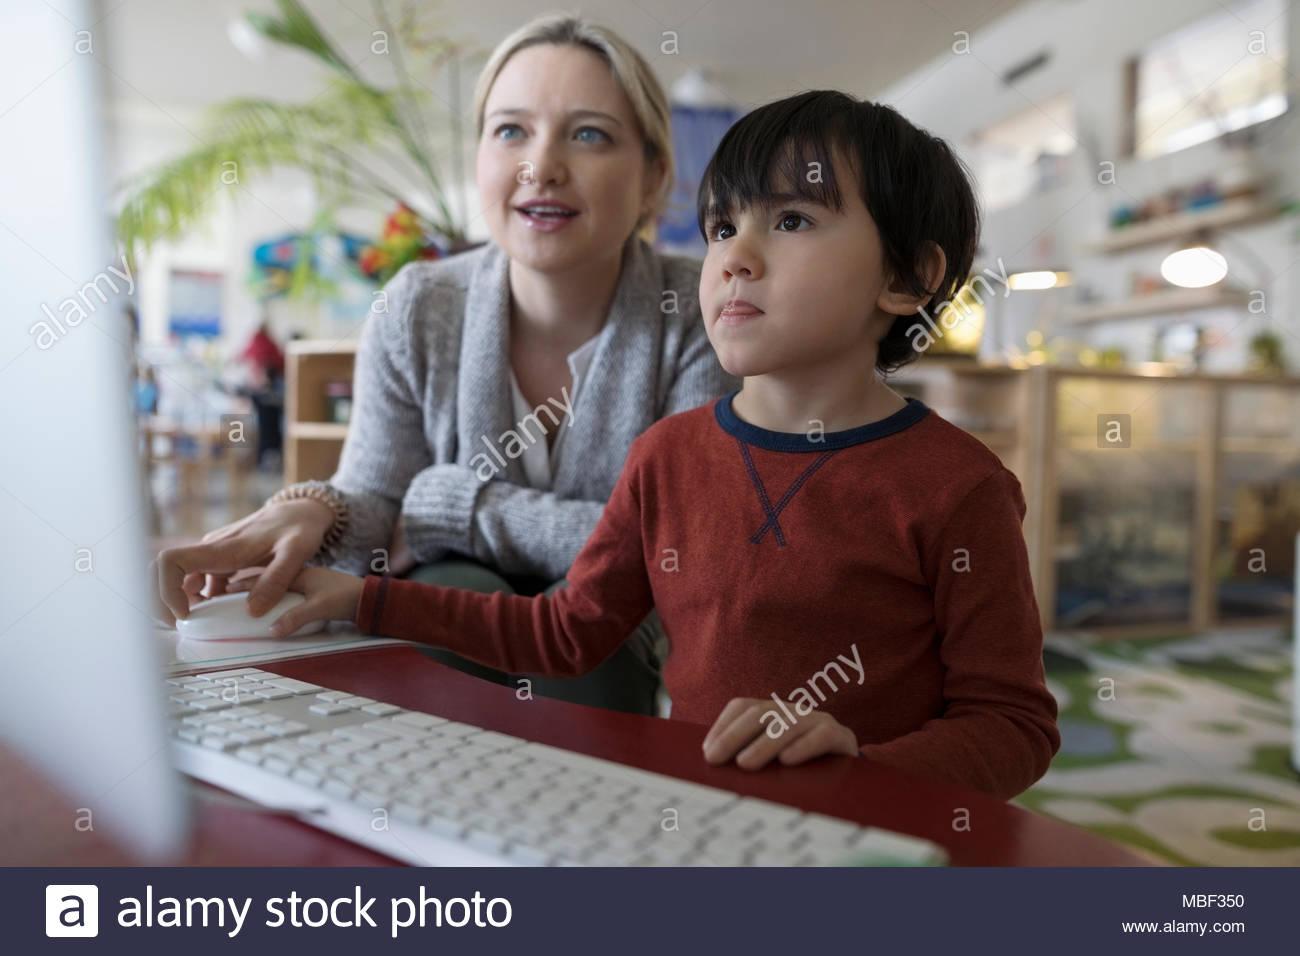 Preschool teacher and boy student at computer - Stock Image